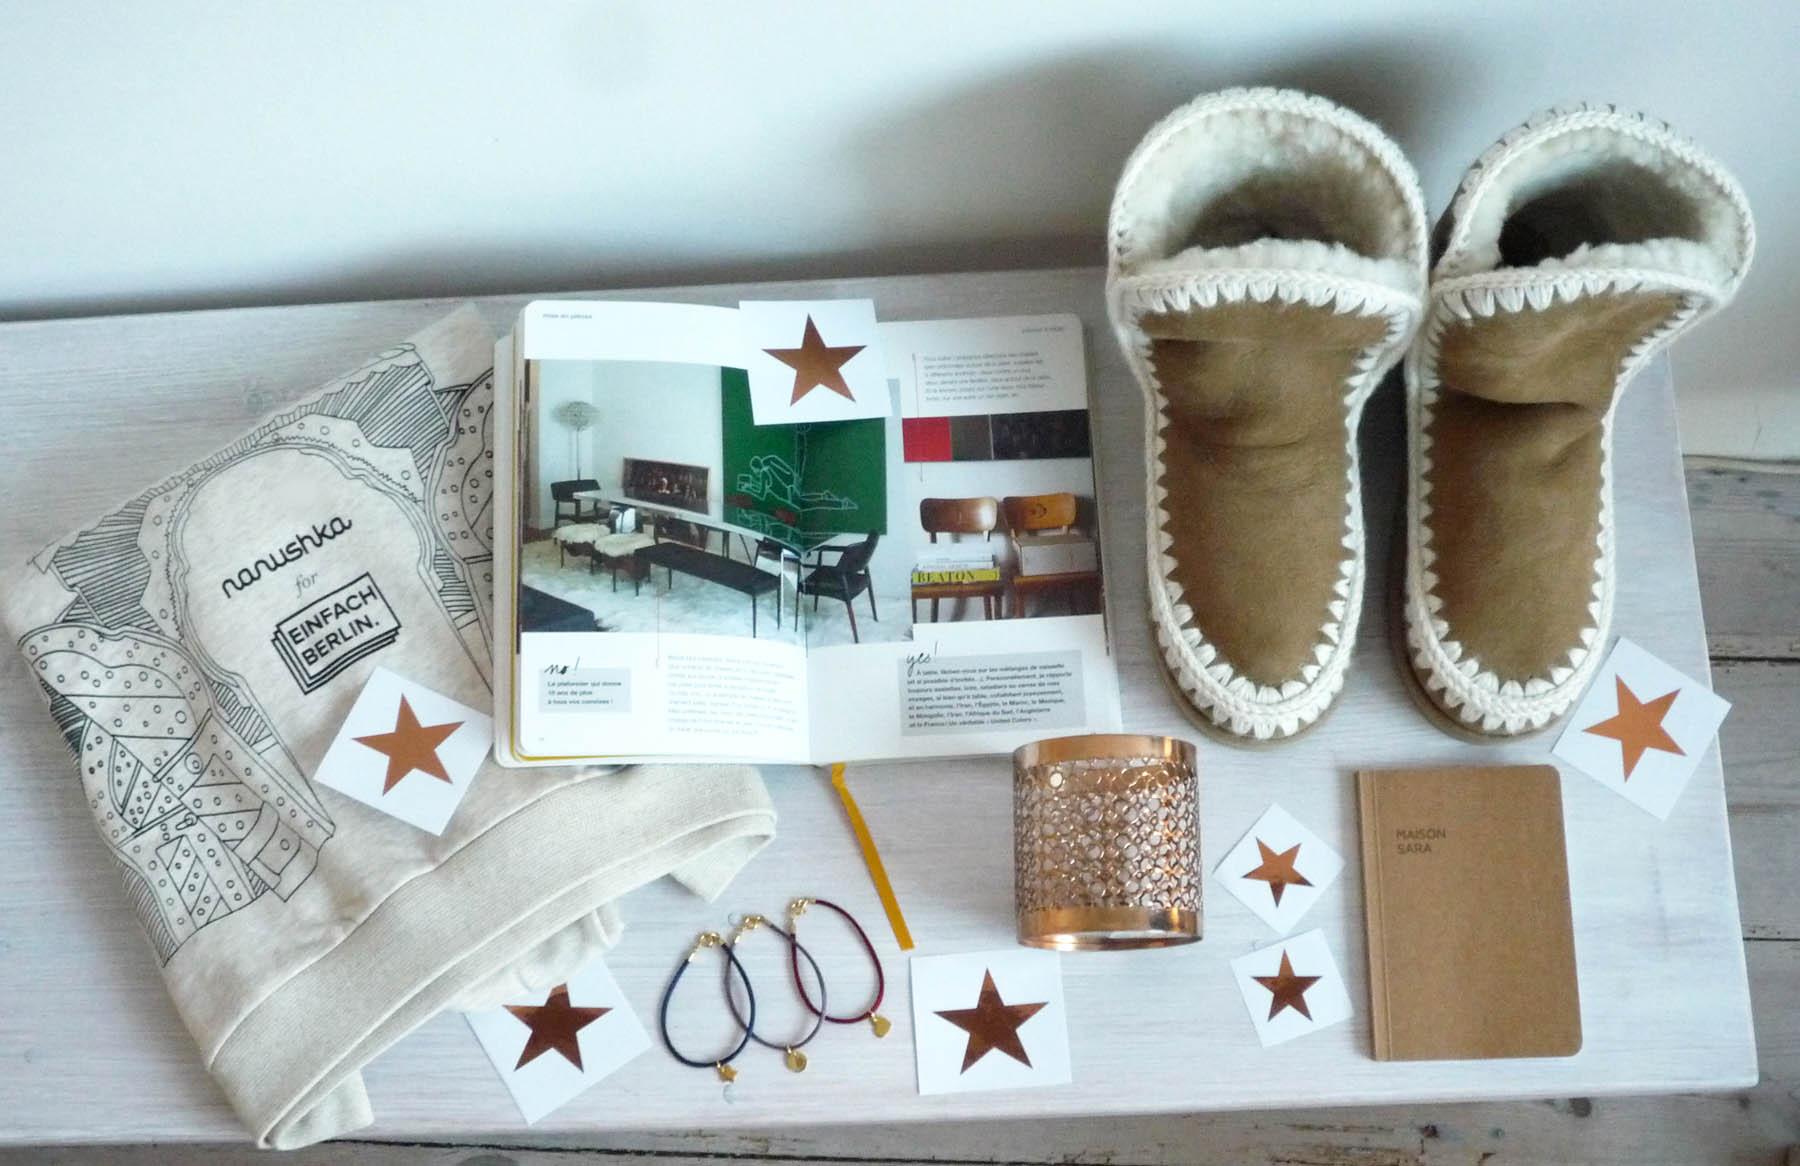 alexas 7 little things sweatshirt aus budapest mou boots und kupfer accessoires journelles. Black Bedroom Furniture Sets. Home Design Ideas